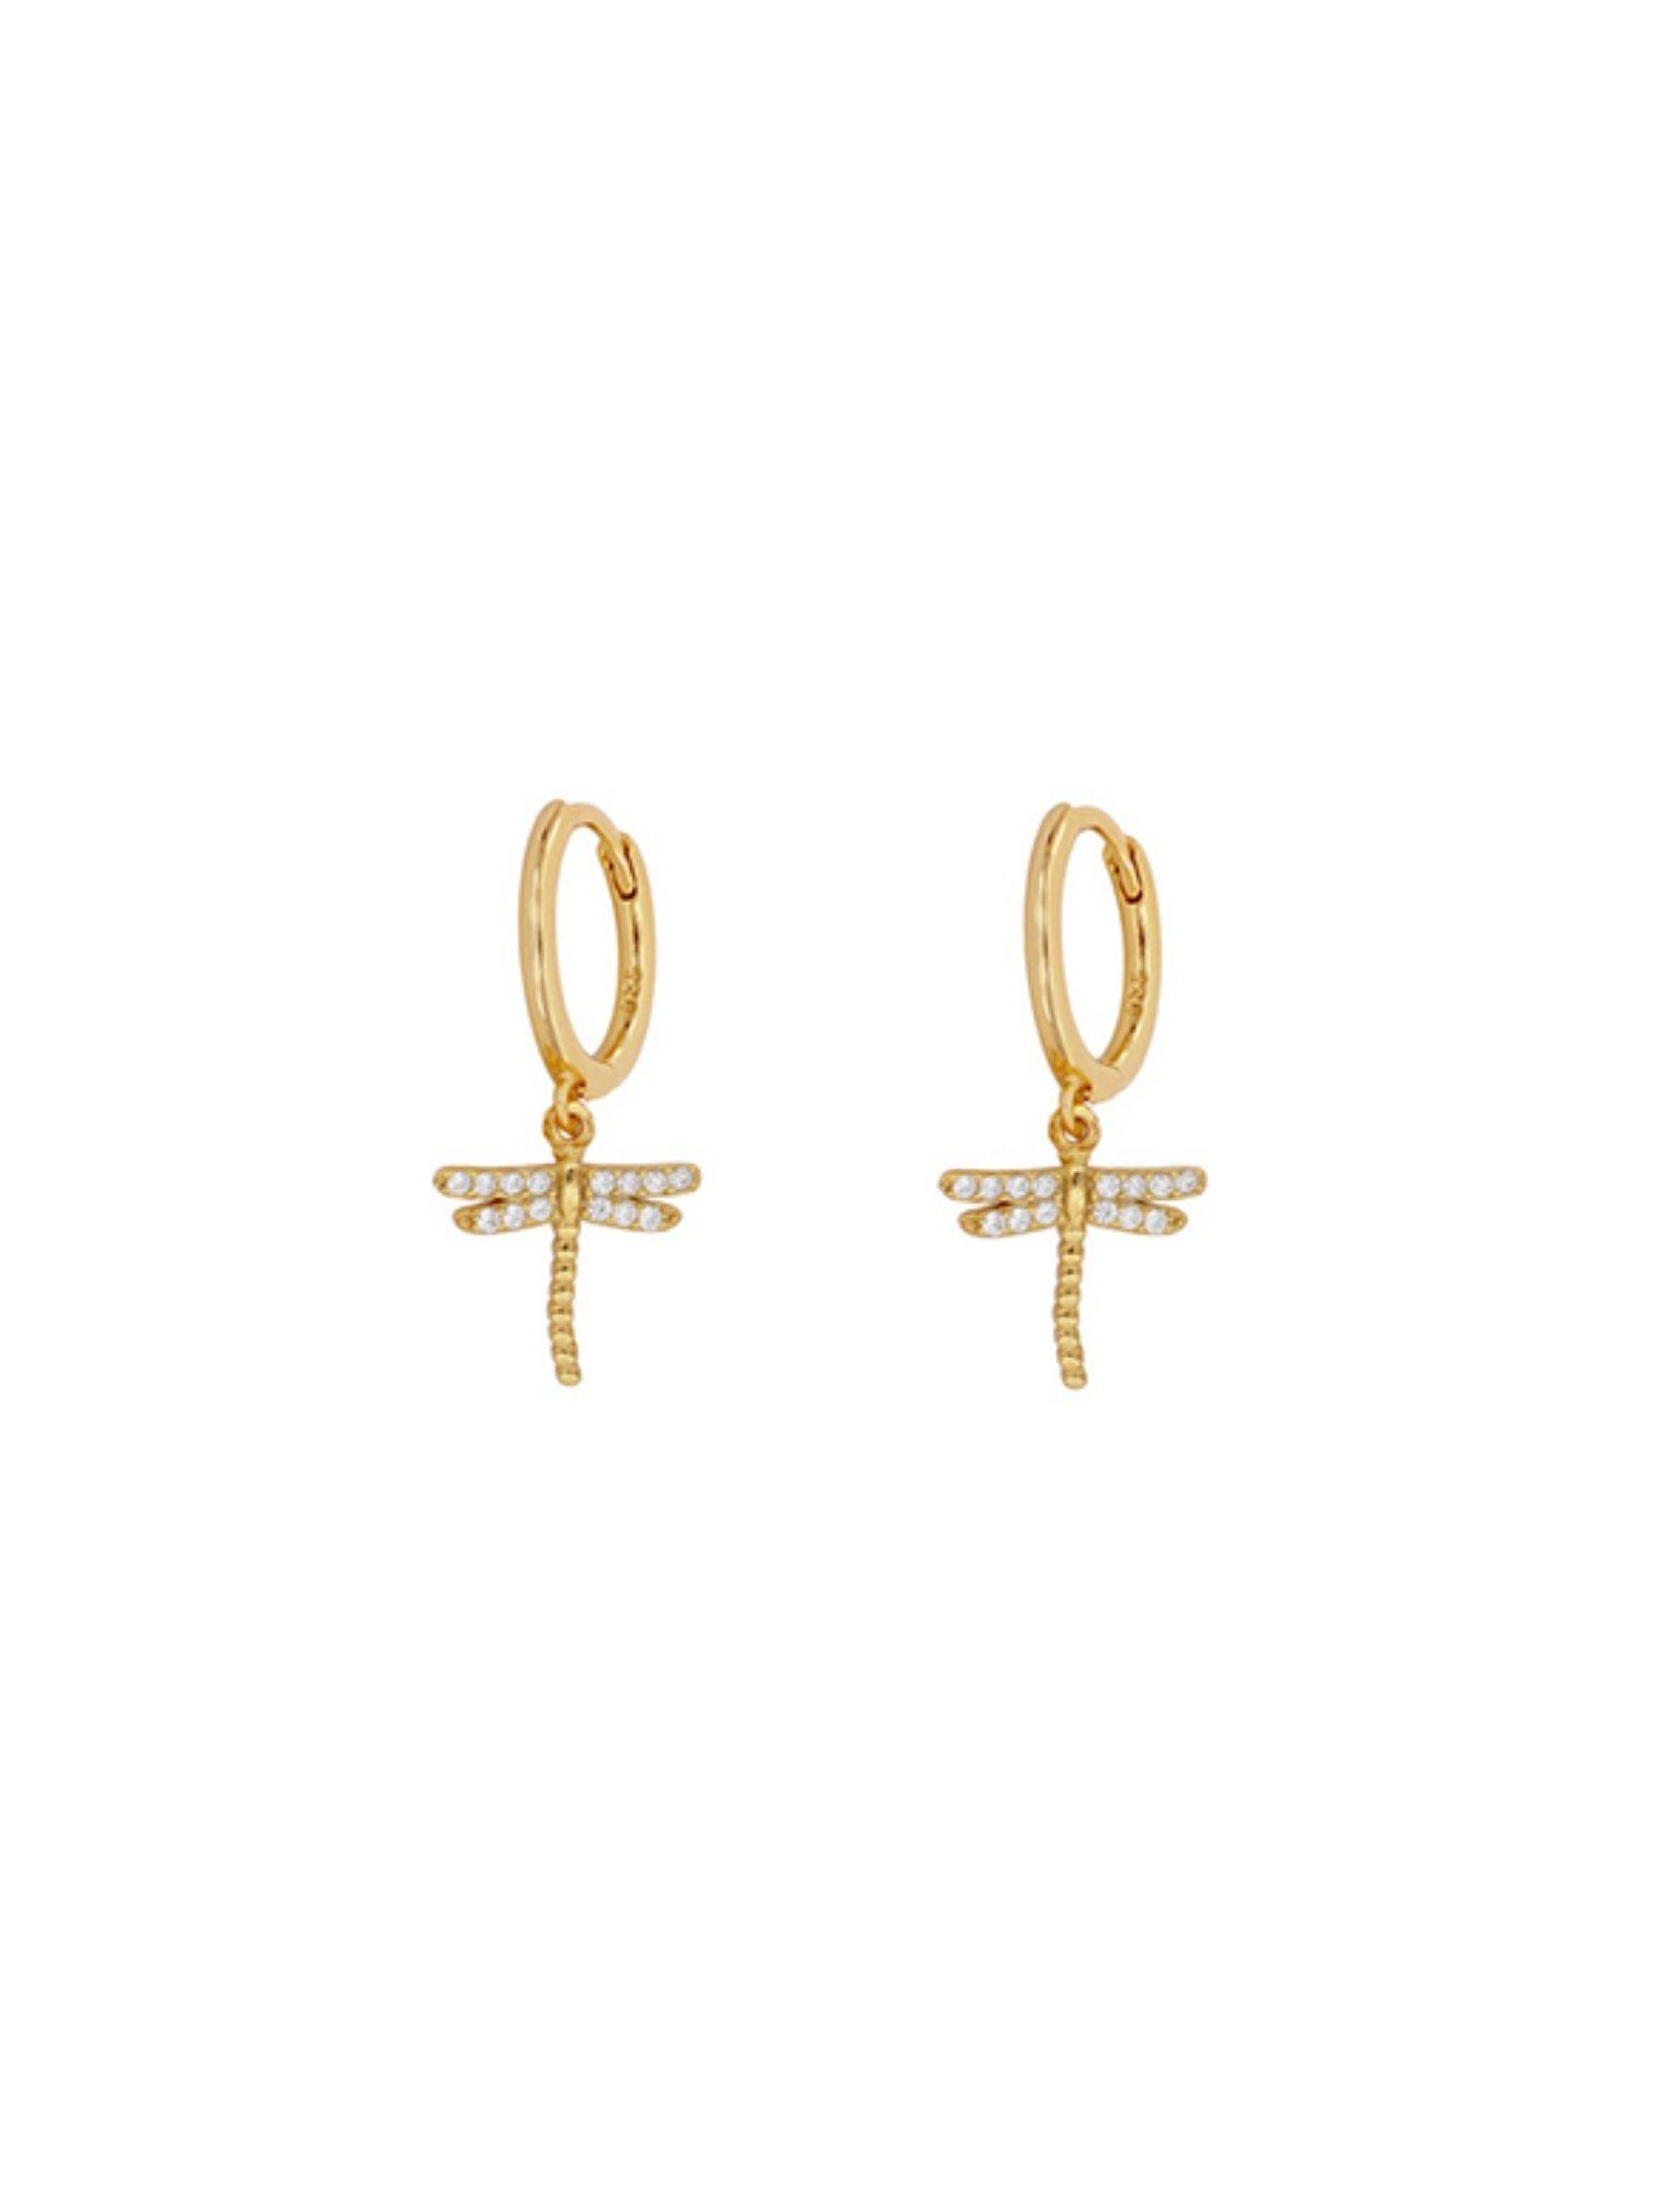 pendientes aro dragonfly con charm de libélula en oro